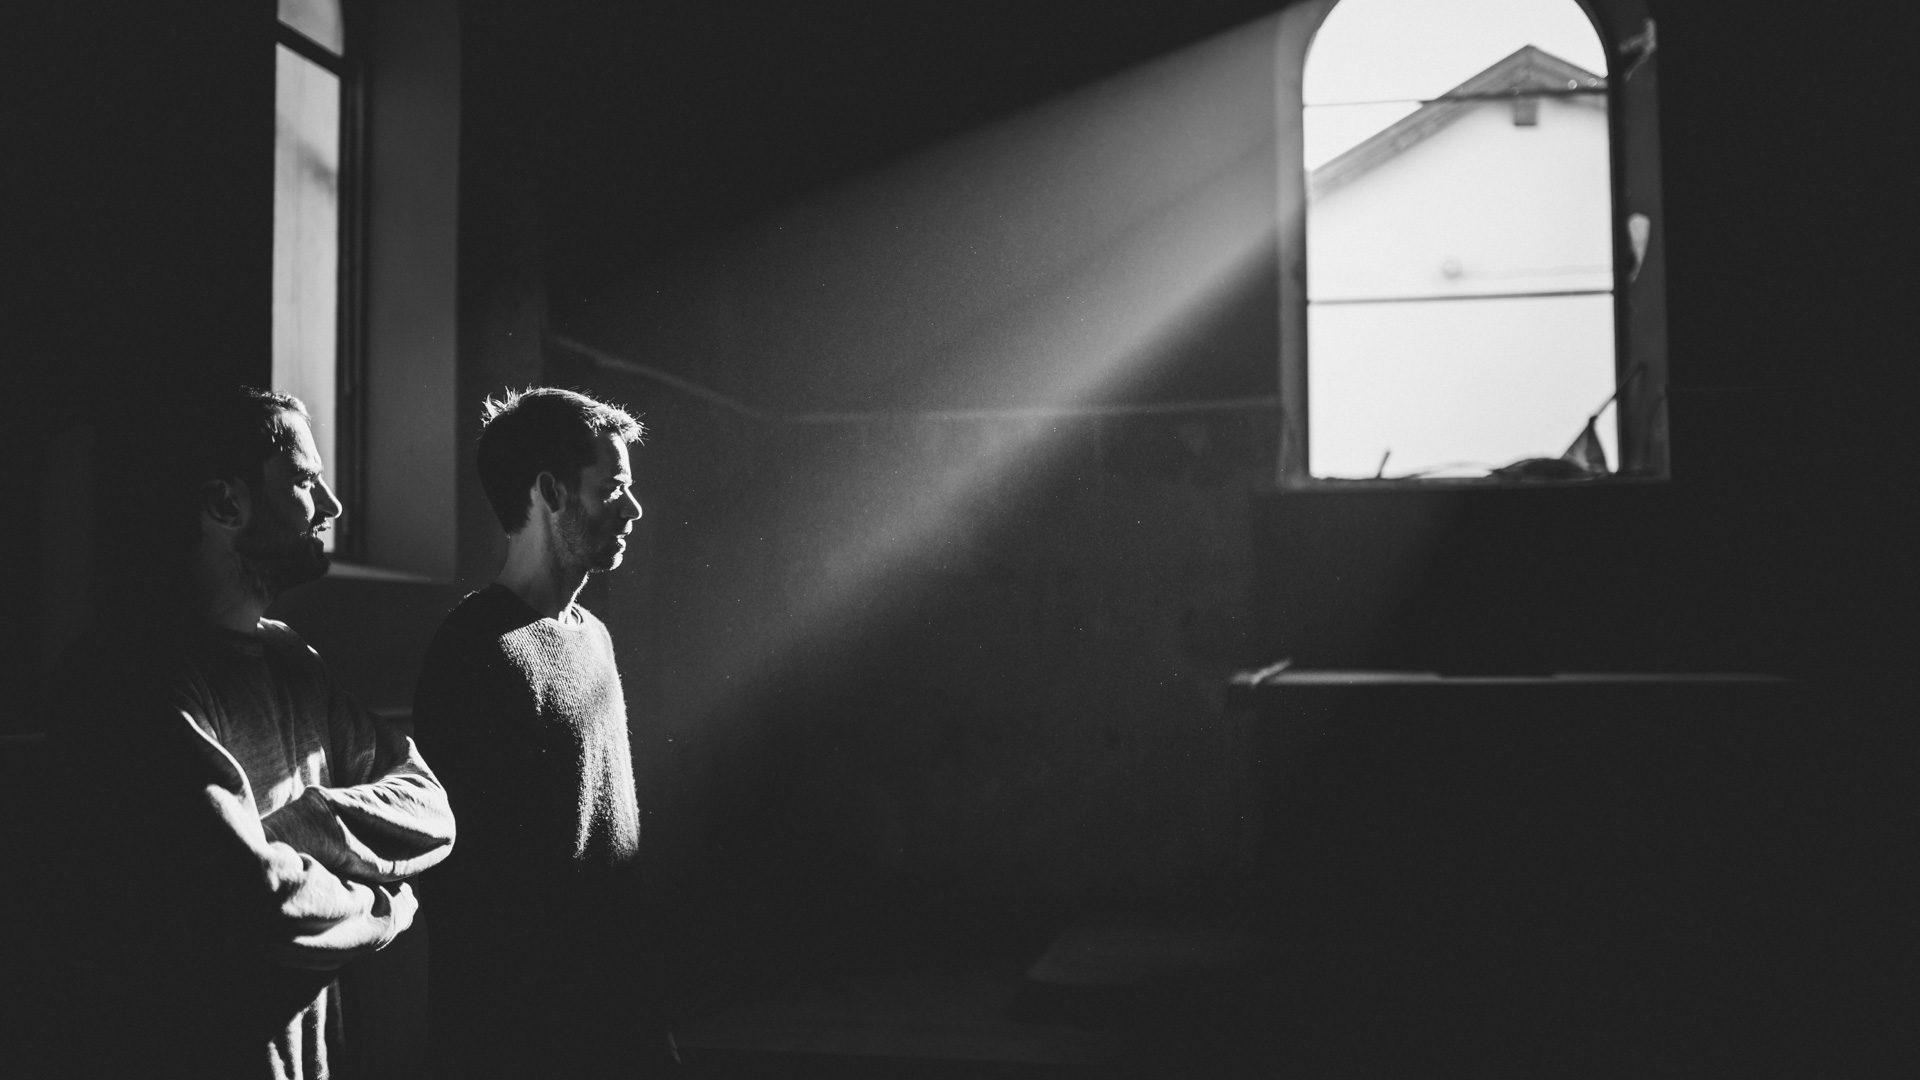 Damien-Dohmen-photographe-XVClasses-7